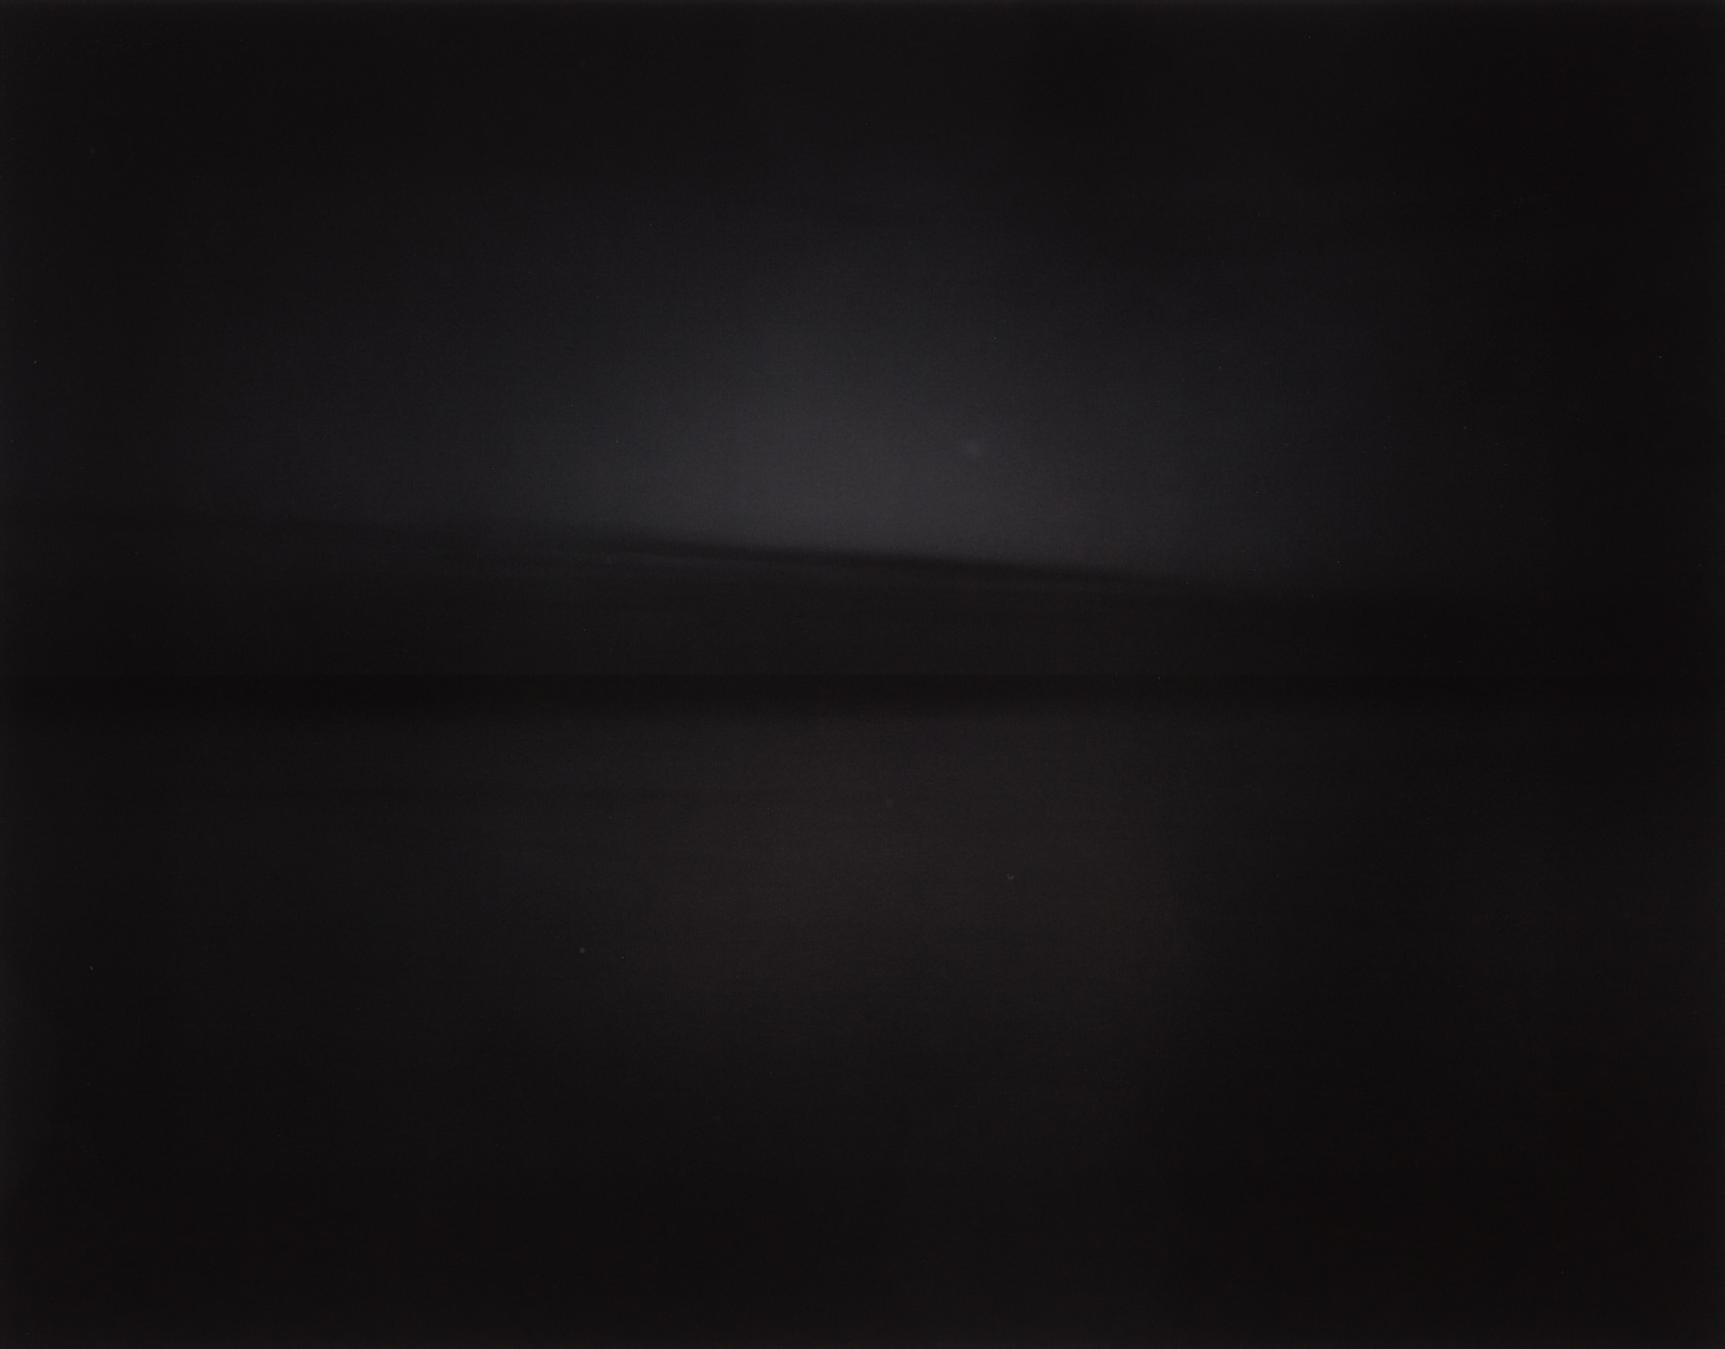 Hiroshi Sugimoto-Reunion Island, Indian Ocean-1996